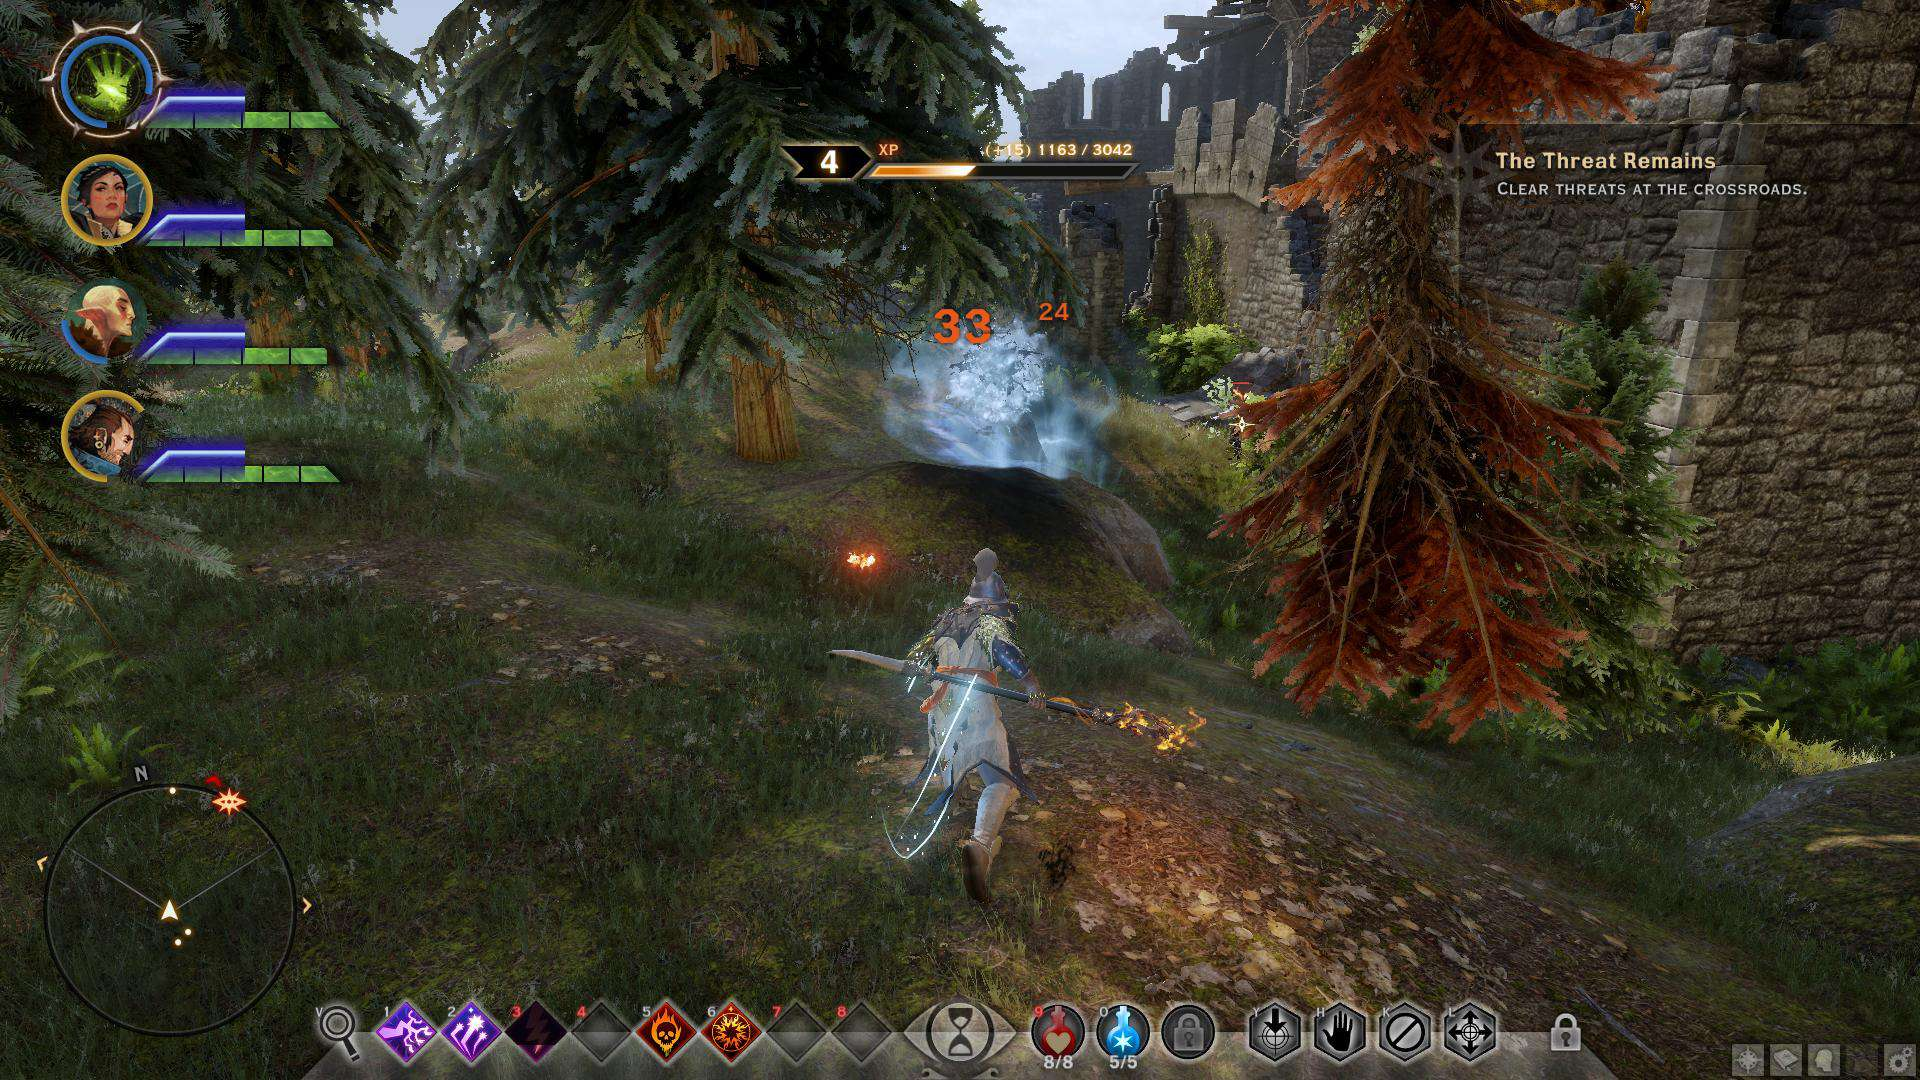 dragon age inquisition crack download torrent